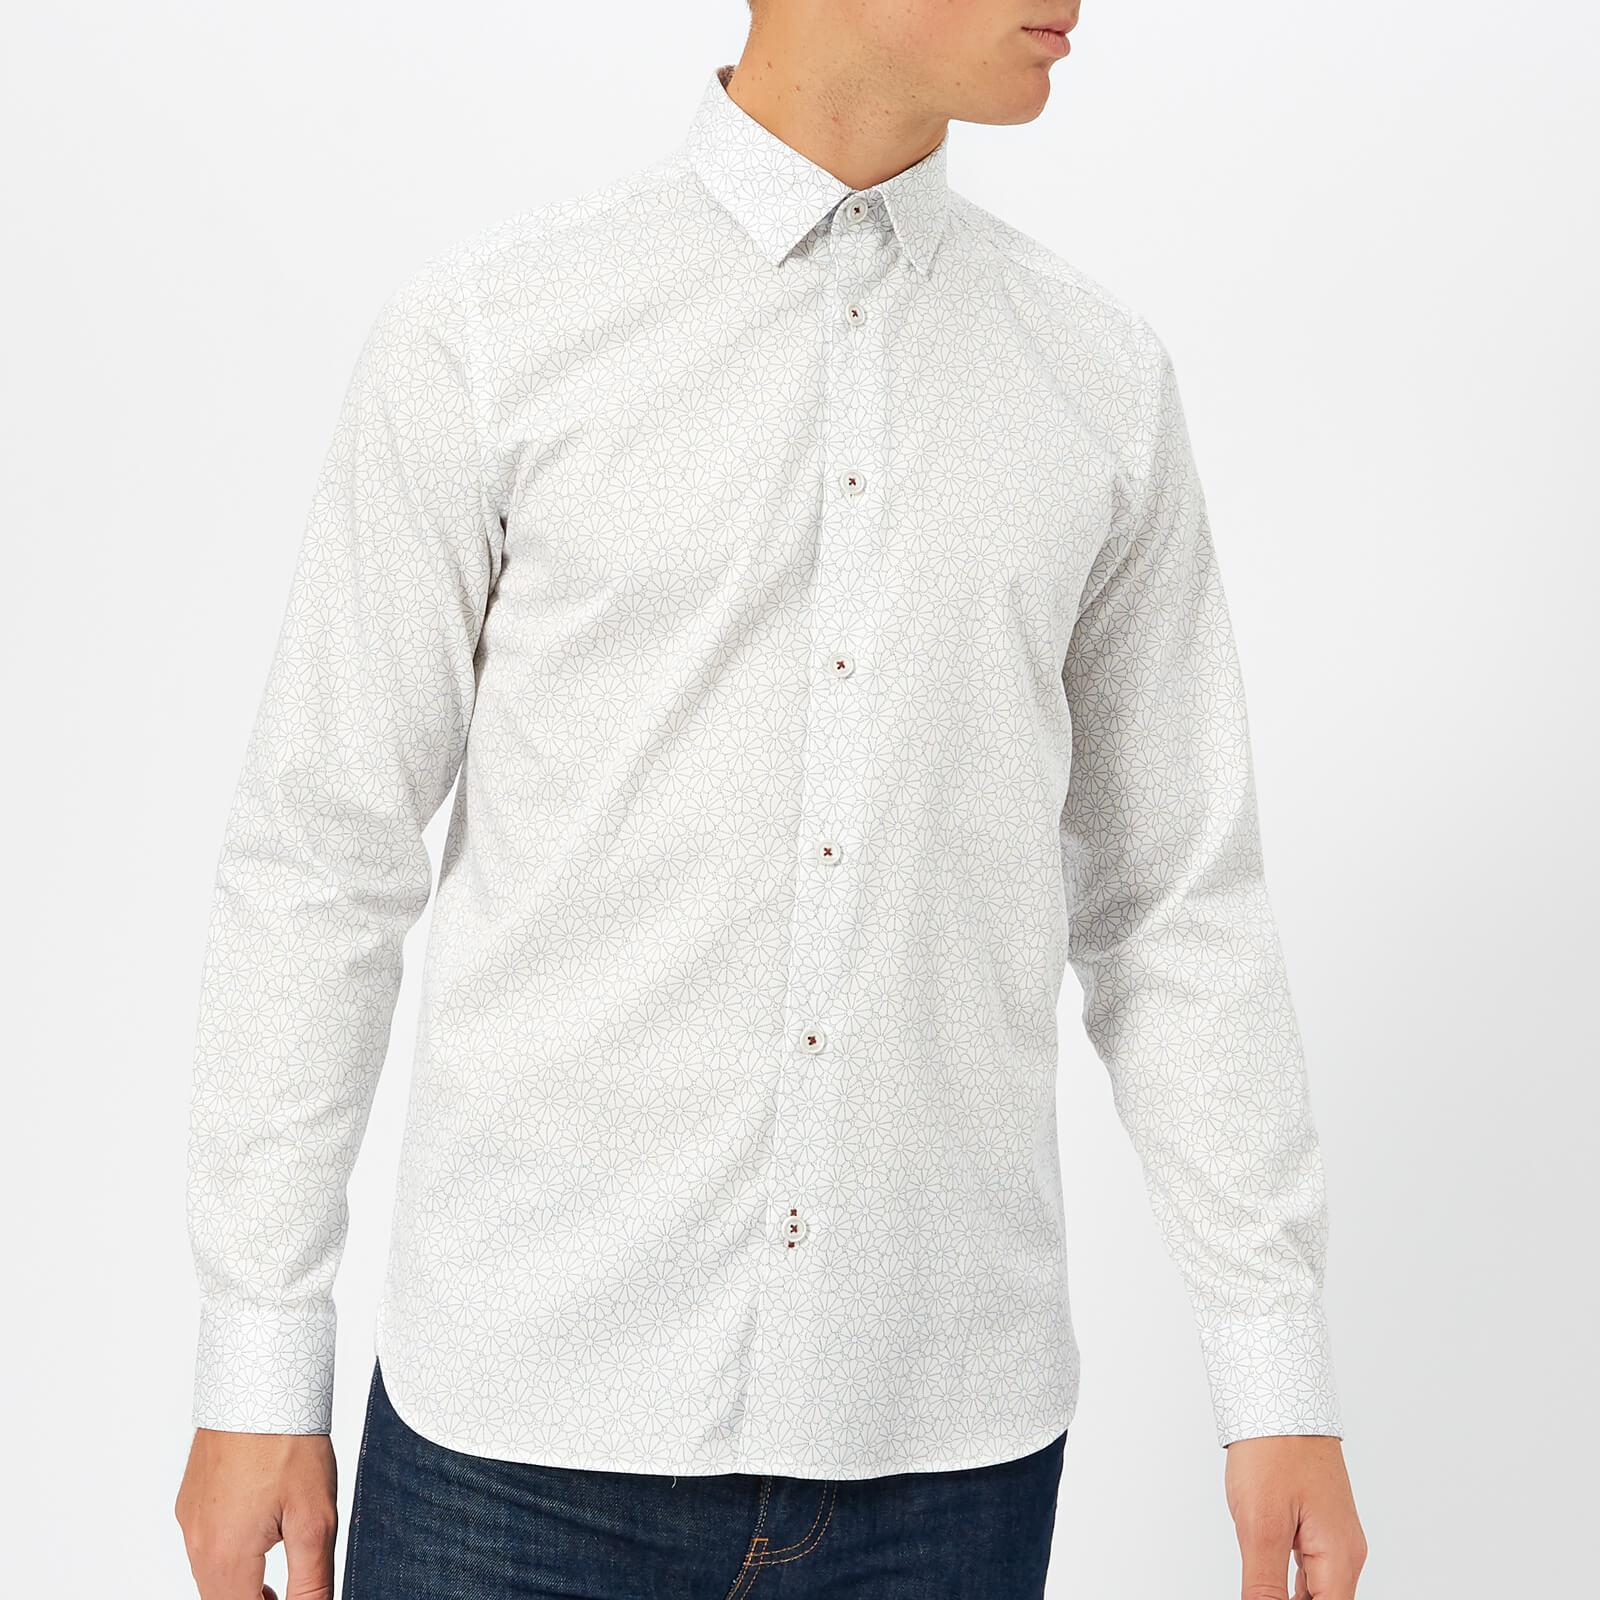 da2d511e5c4ab0 Lyst - Ted Baker Finsbur Floral Geo Printed Shirt in White for Men